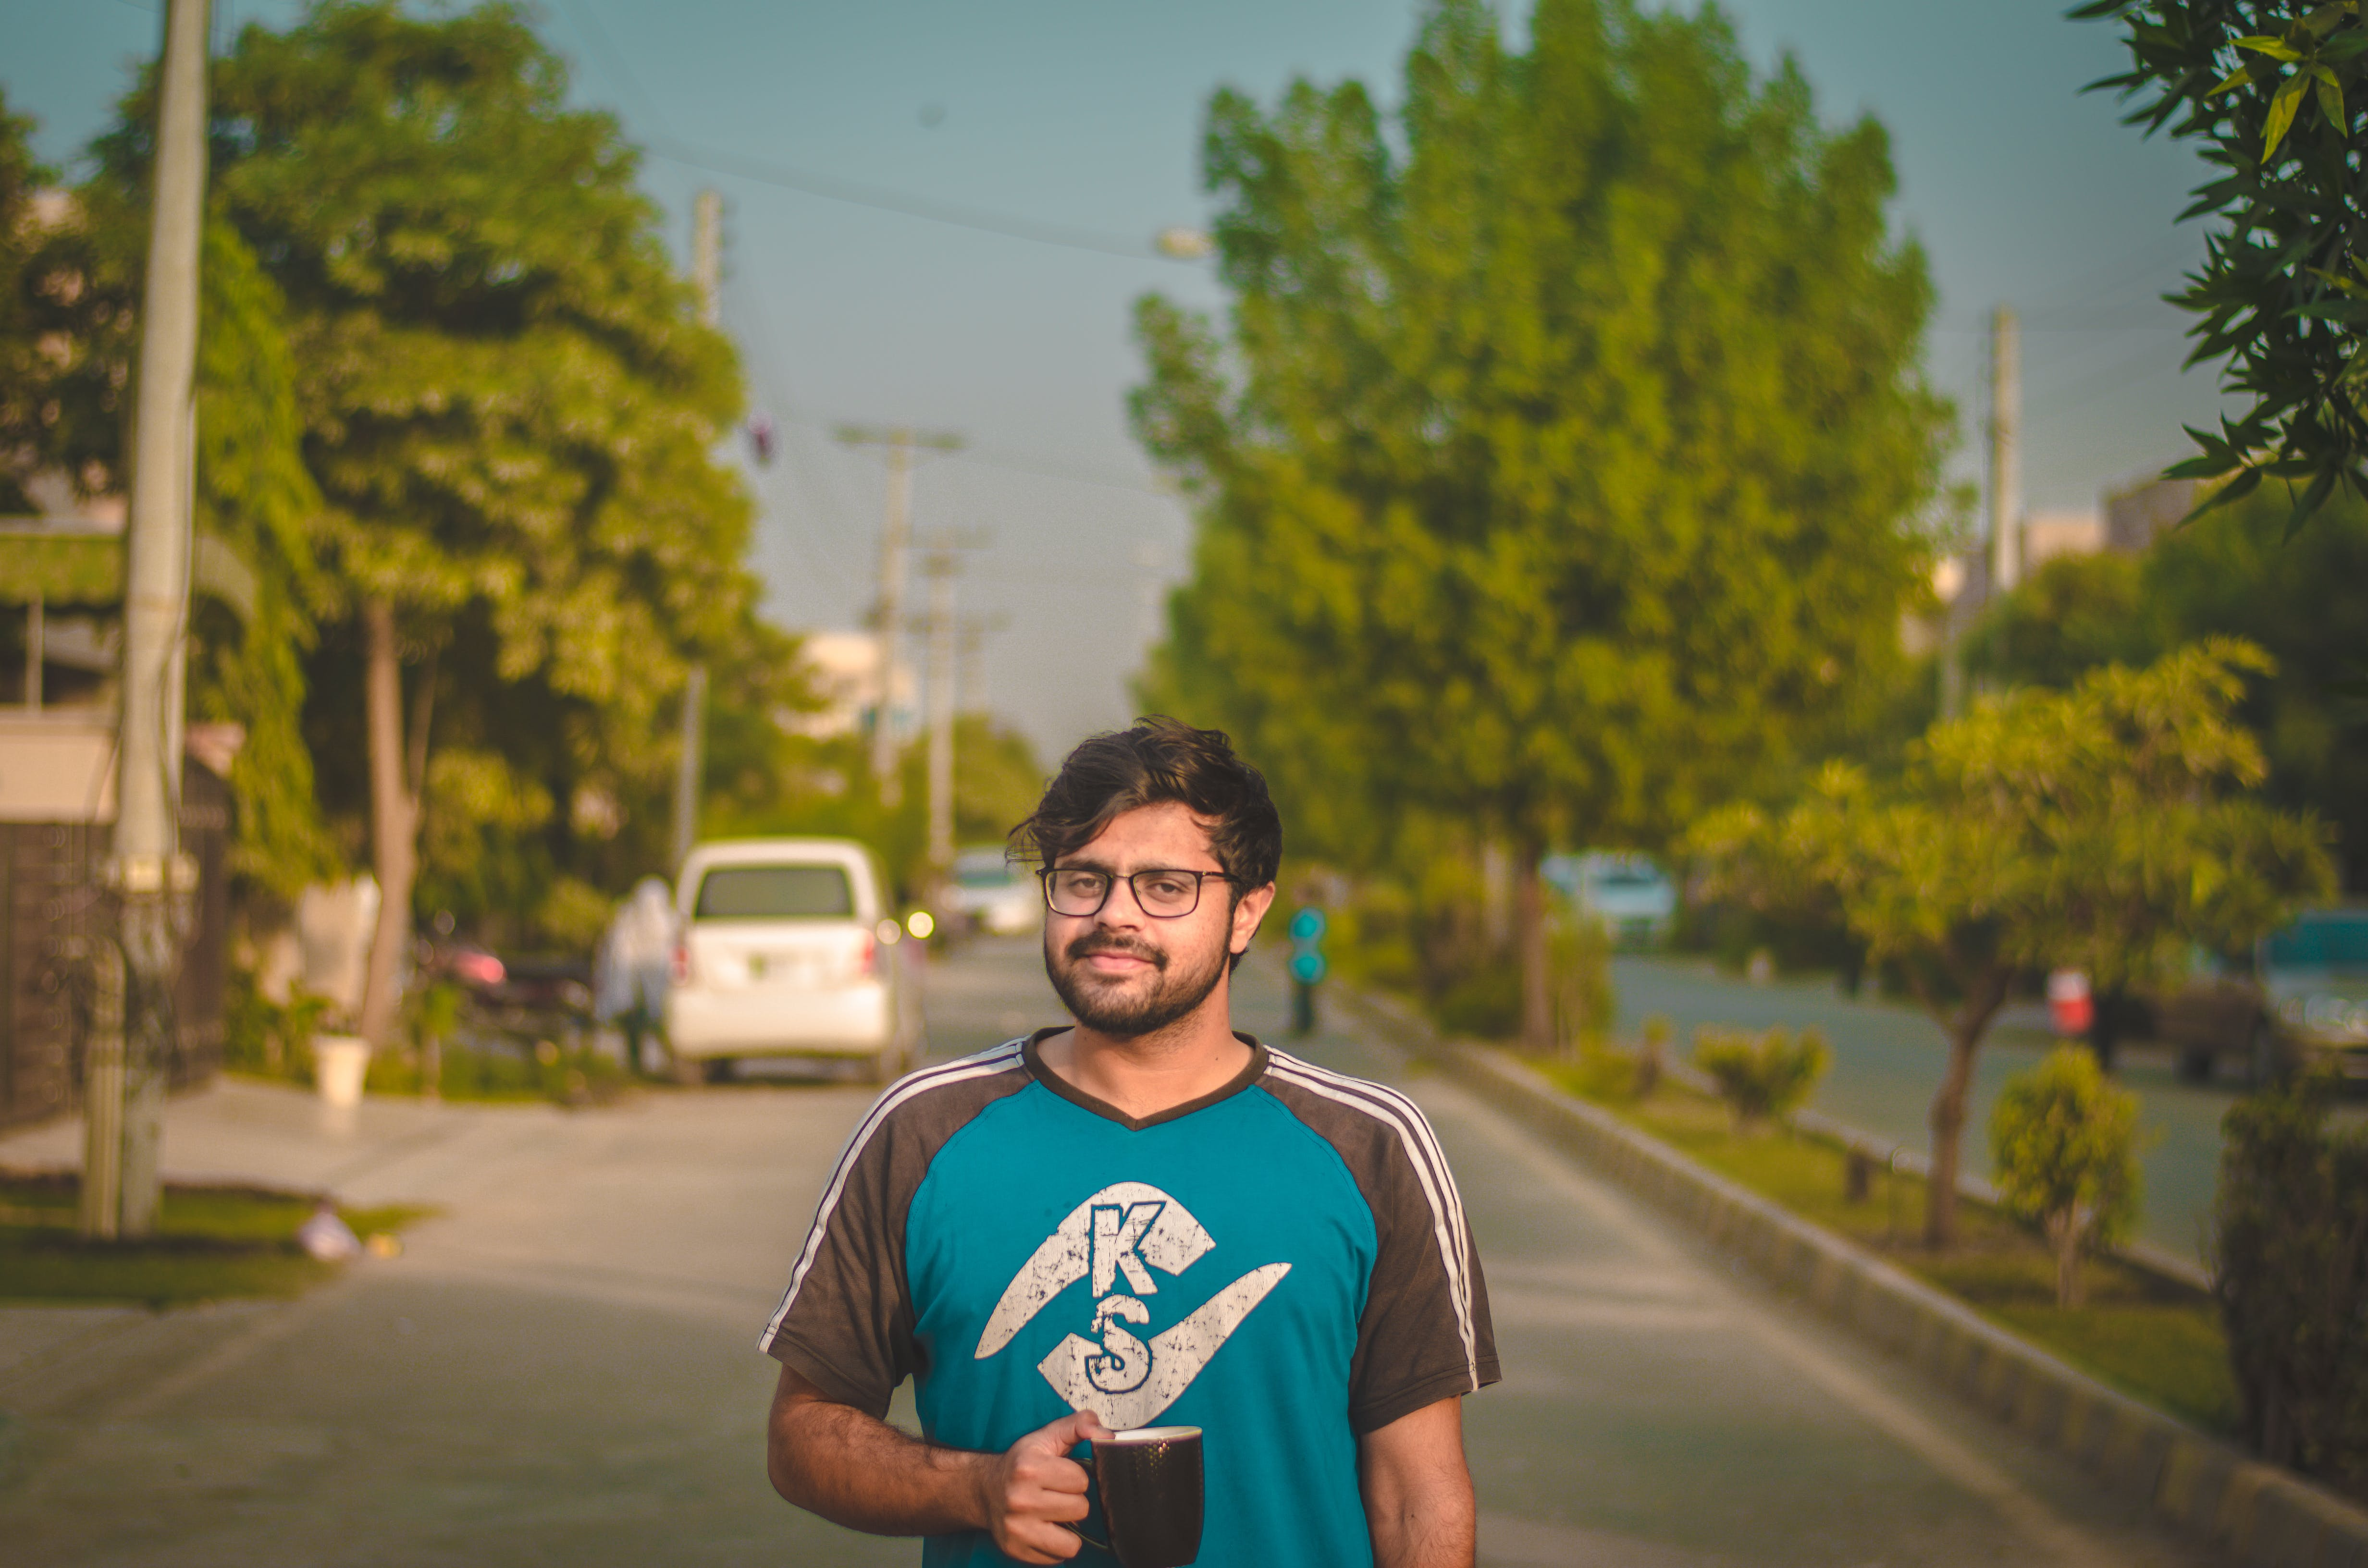 Man Standing on Road While Holding Black Ceramic Mug